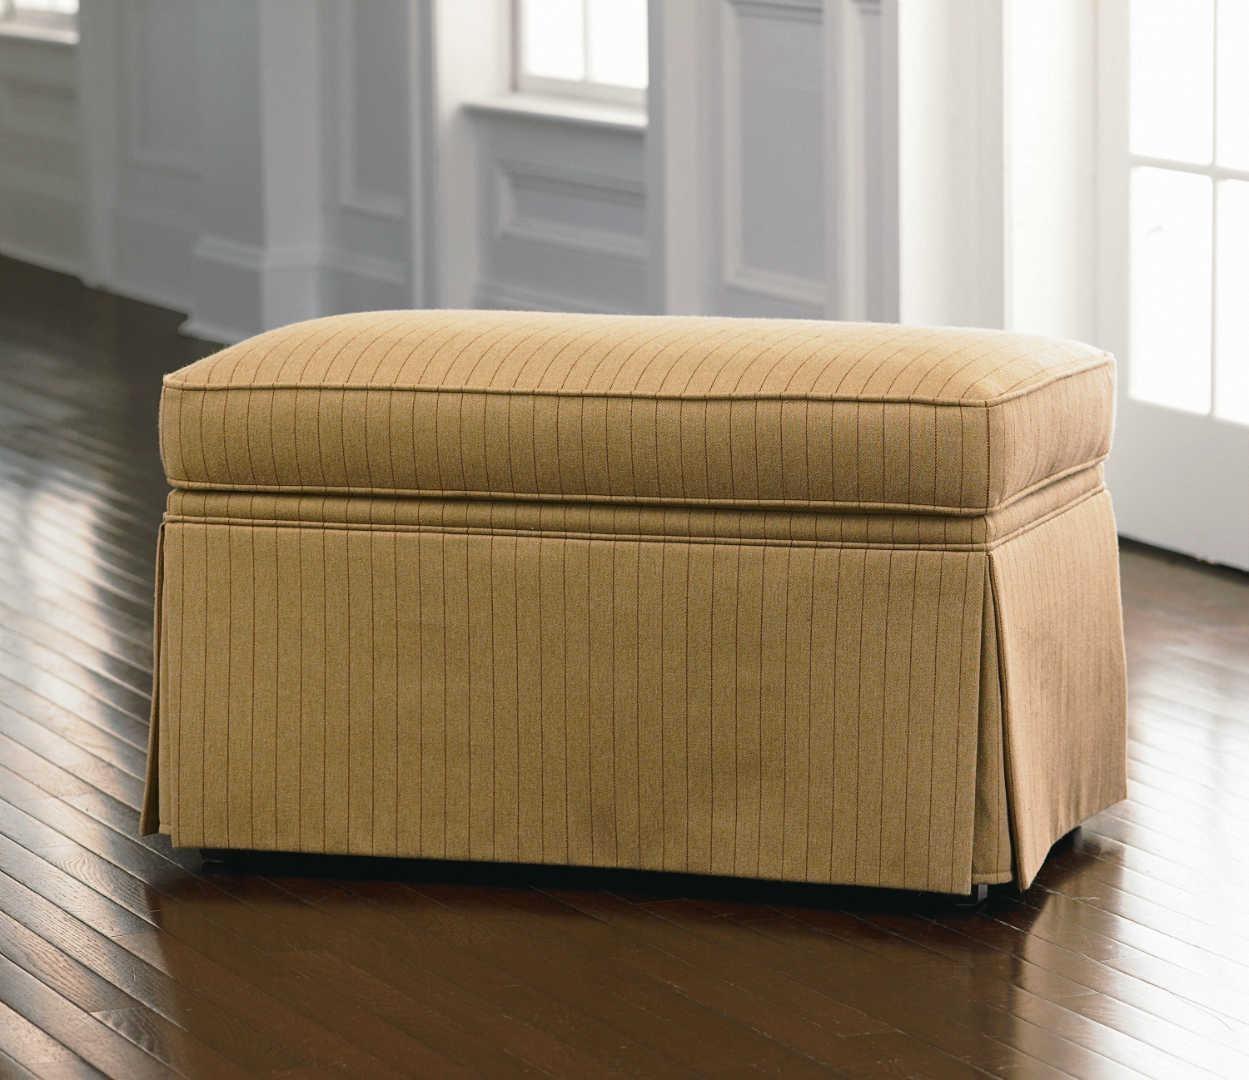 Bassett HGTV Home Design Studio 4000 11 Customizable Ottoman